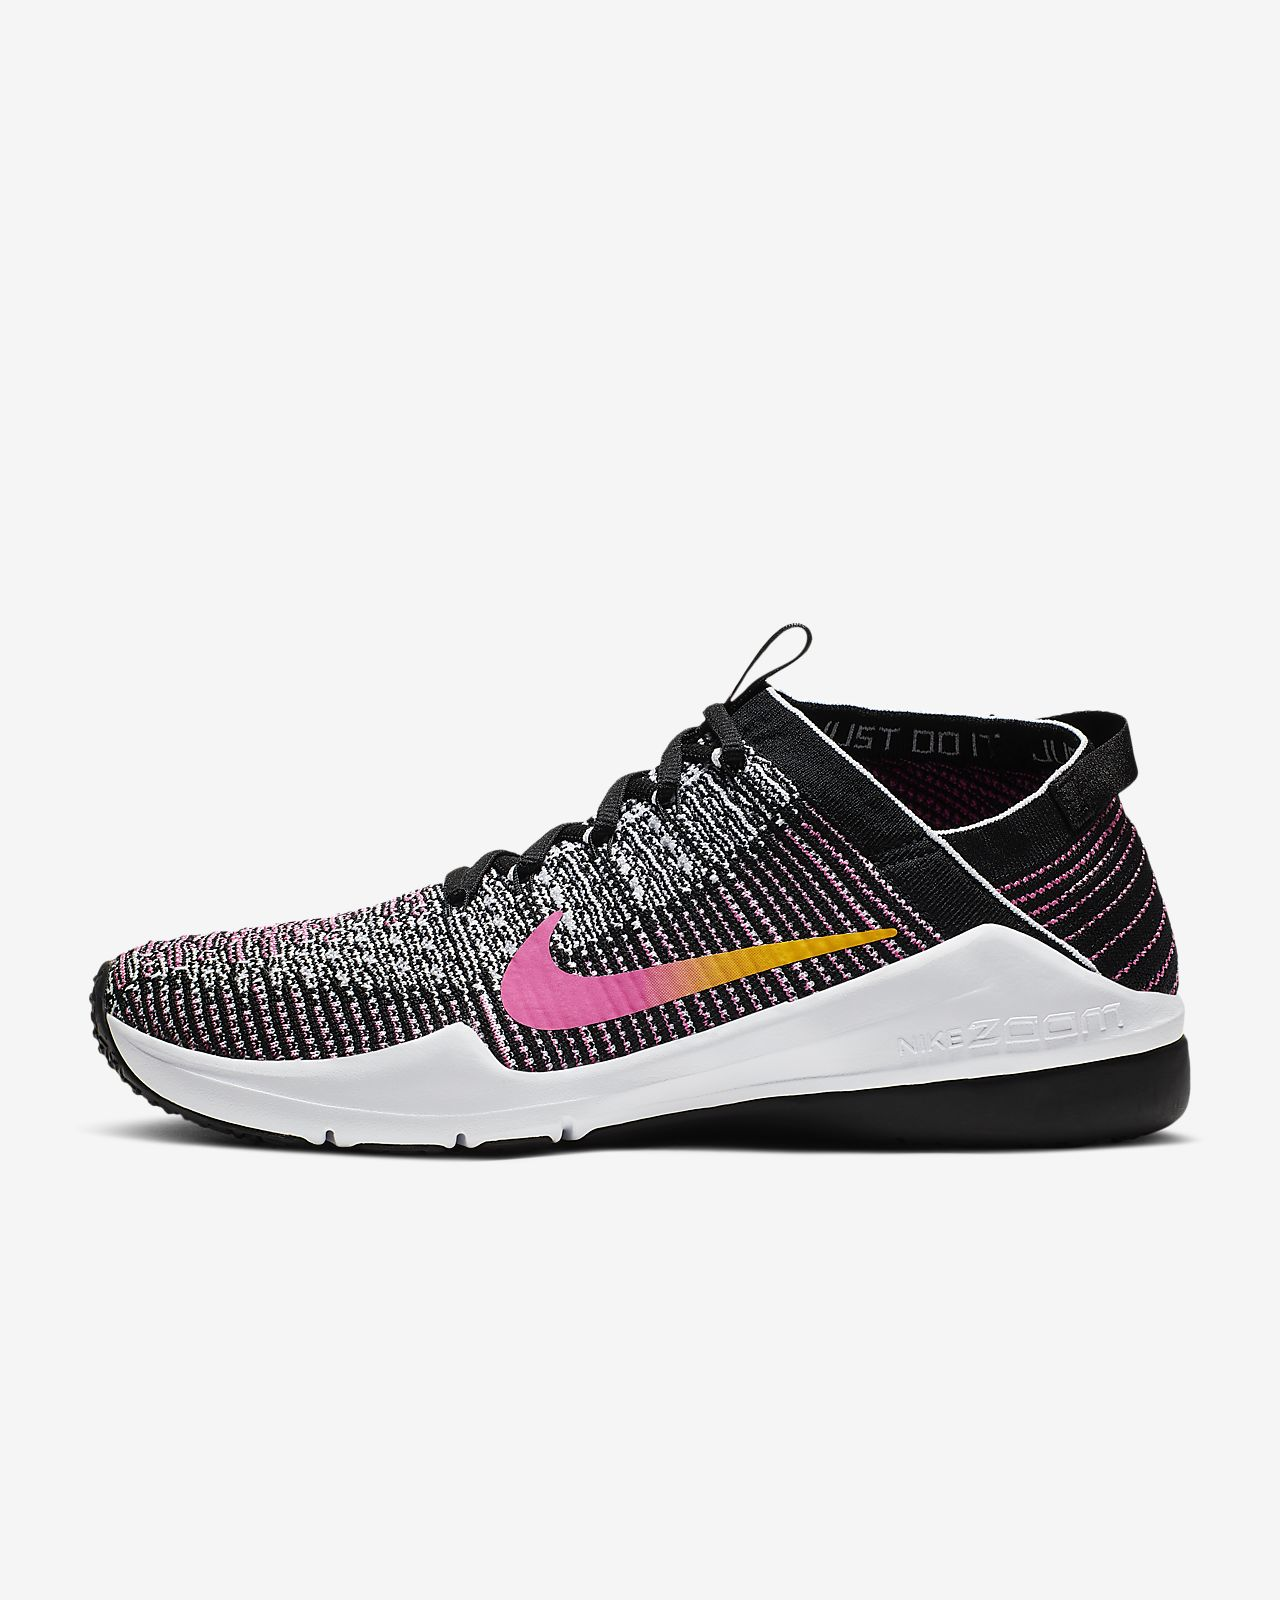 Scarpa da palestra/training/boxe Nike Air Zoom Fearless Flyknit 2 - Donna